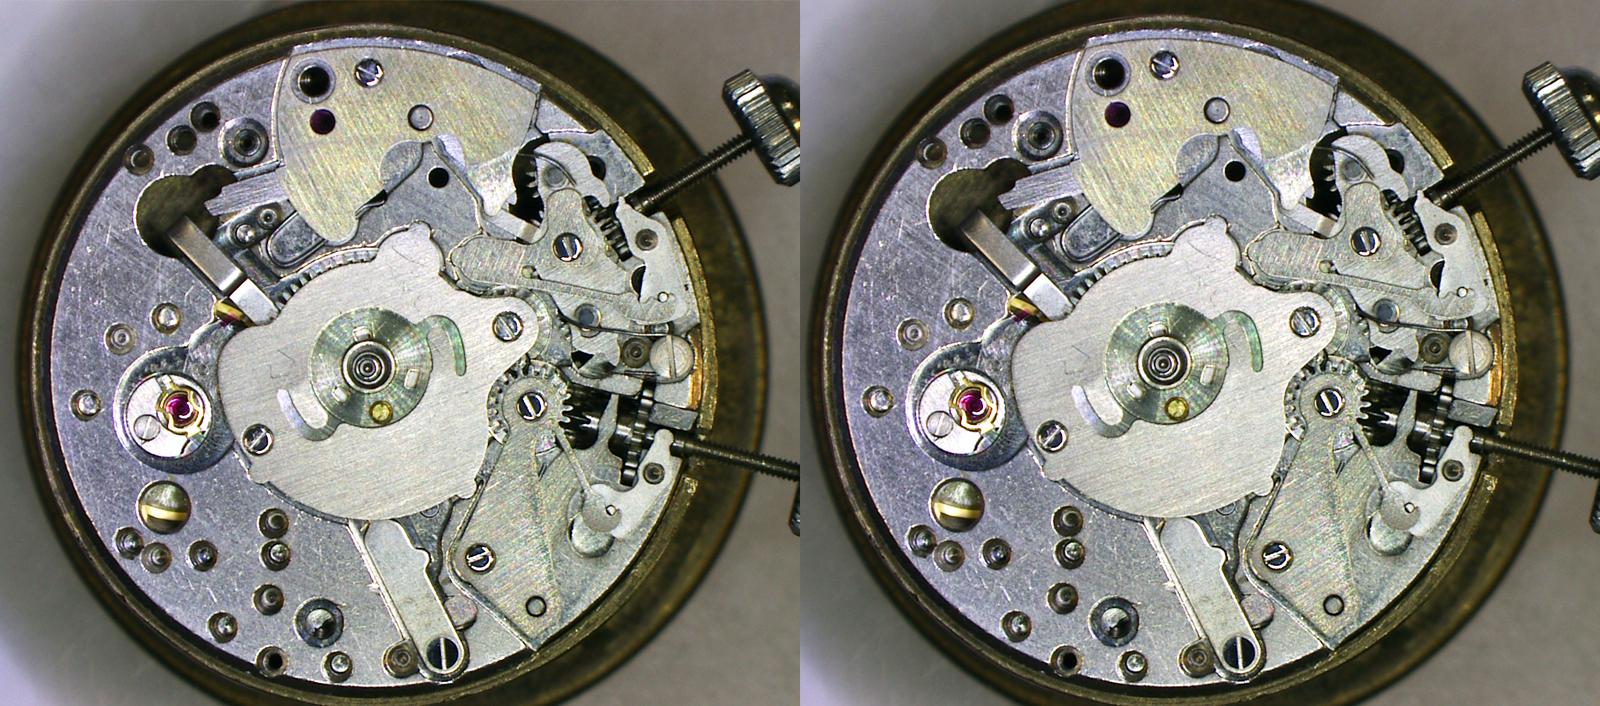 Girard Perregaux Restoration 26.1